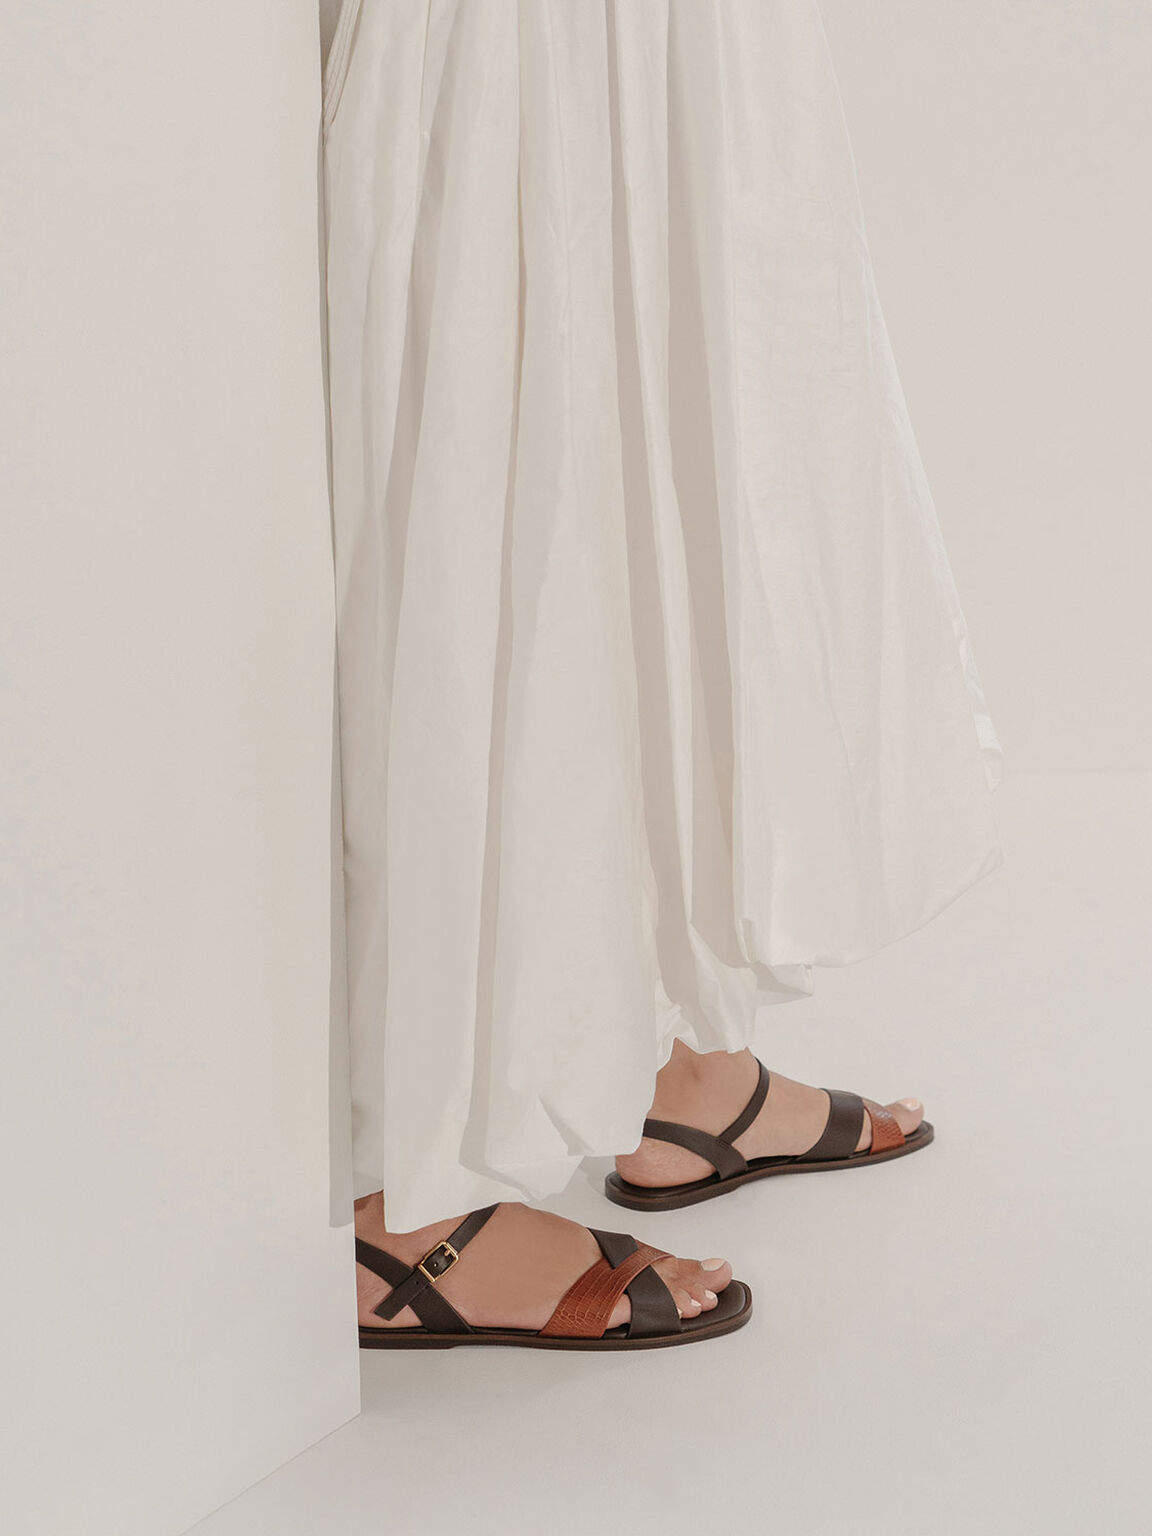 Mock-Croc Flat Sandals, Animal Print Brown, hi-res